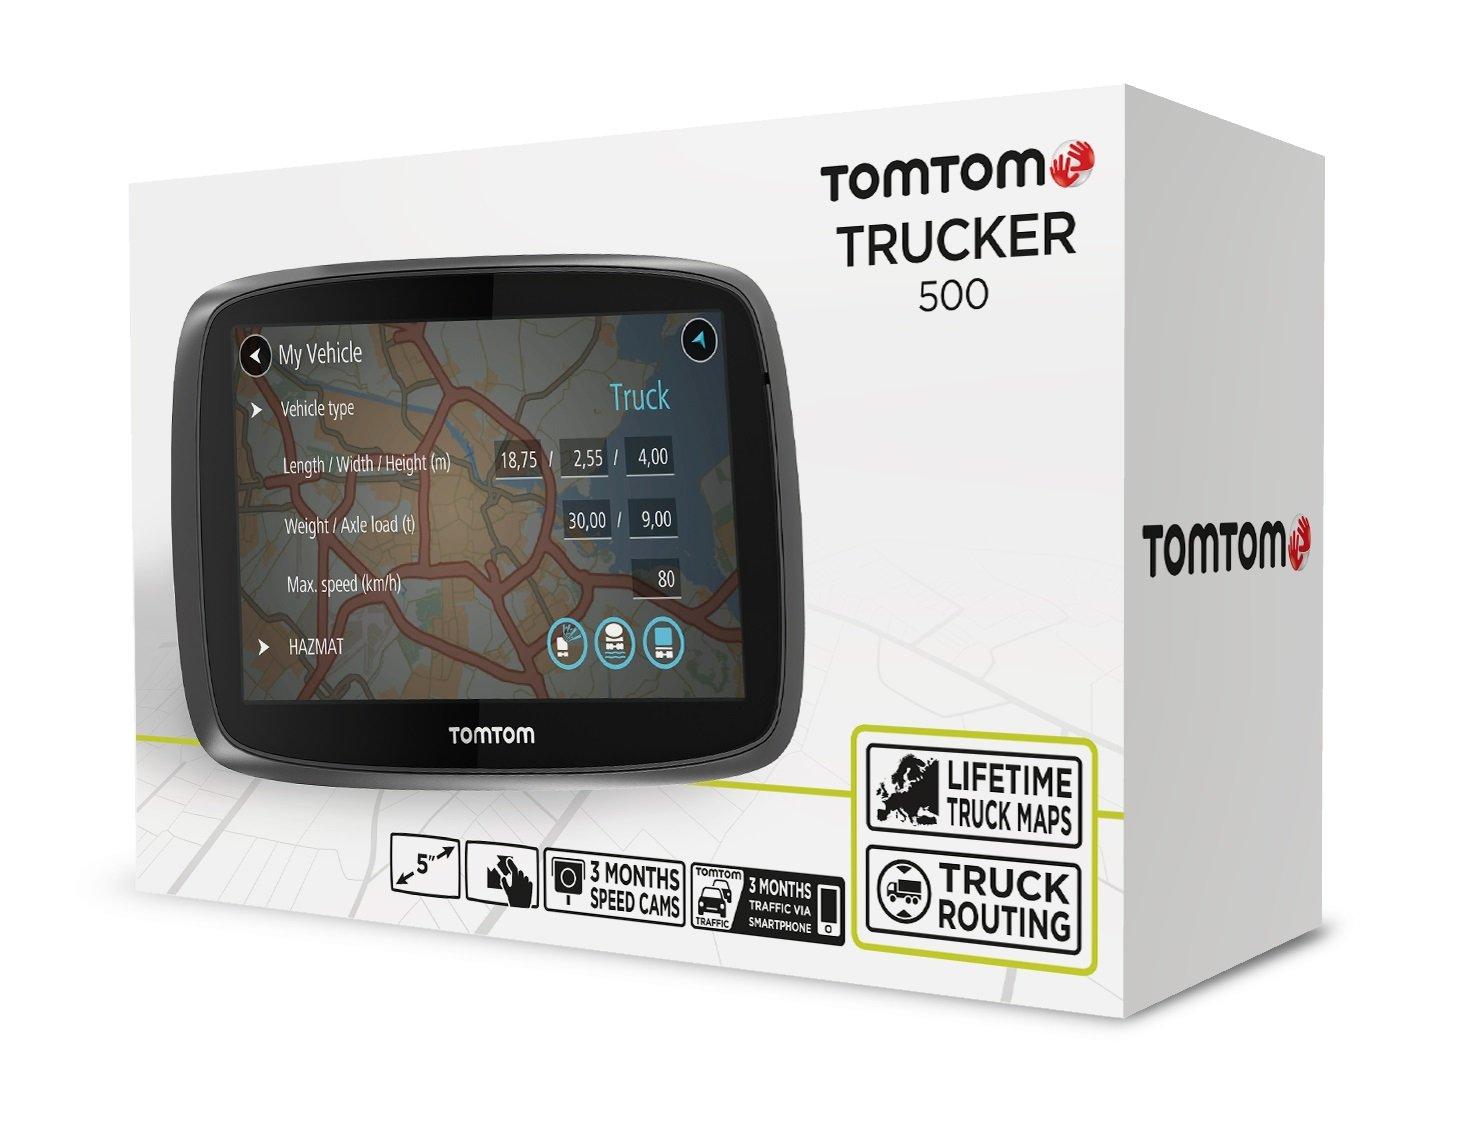 TomTom-Trucker-500-LKW-Navigationsgert-13-cm-5-Zoll-kapazitives-Touch-Display-Sprachsteuerung-ClickGo-Halterung-TrafficLifetime-LKW-Karten-schwarz